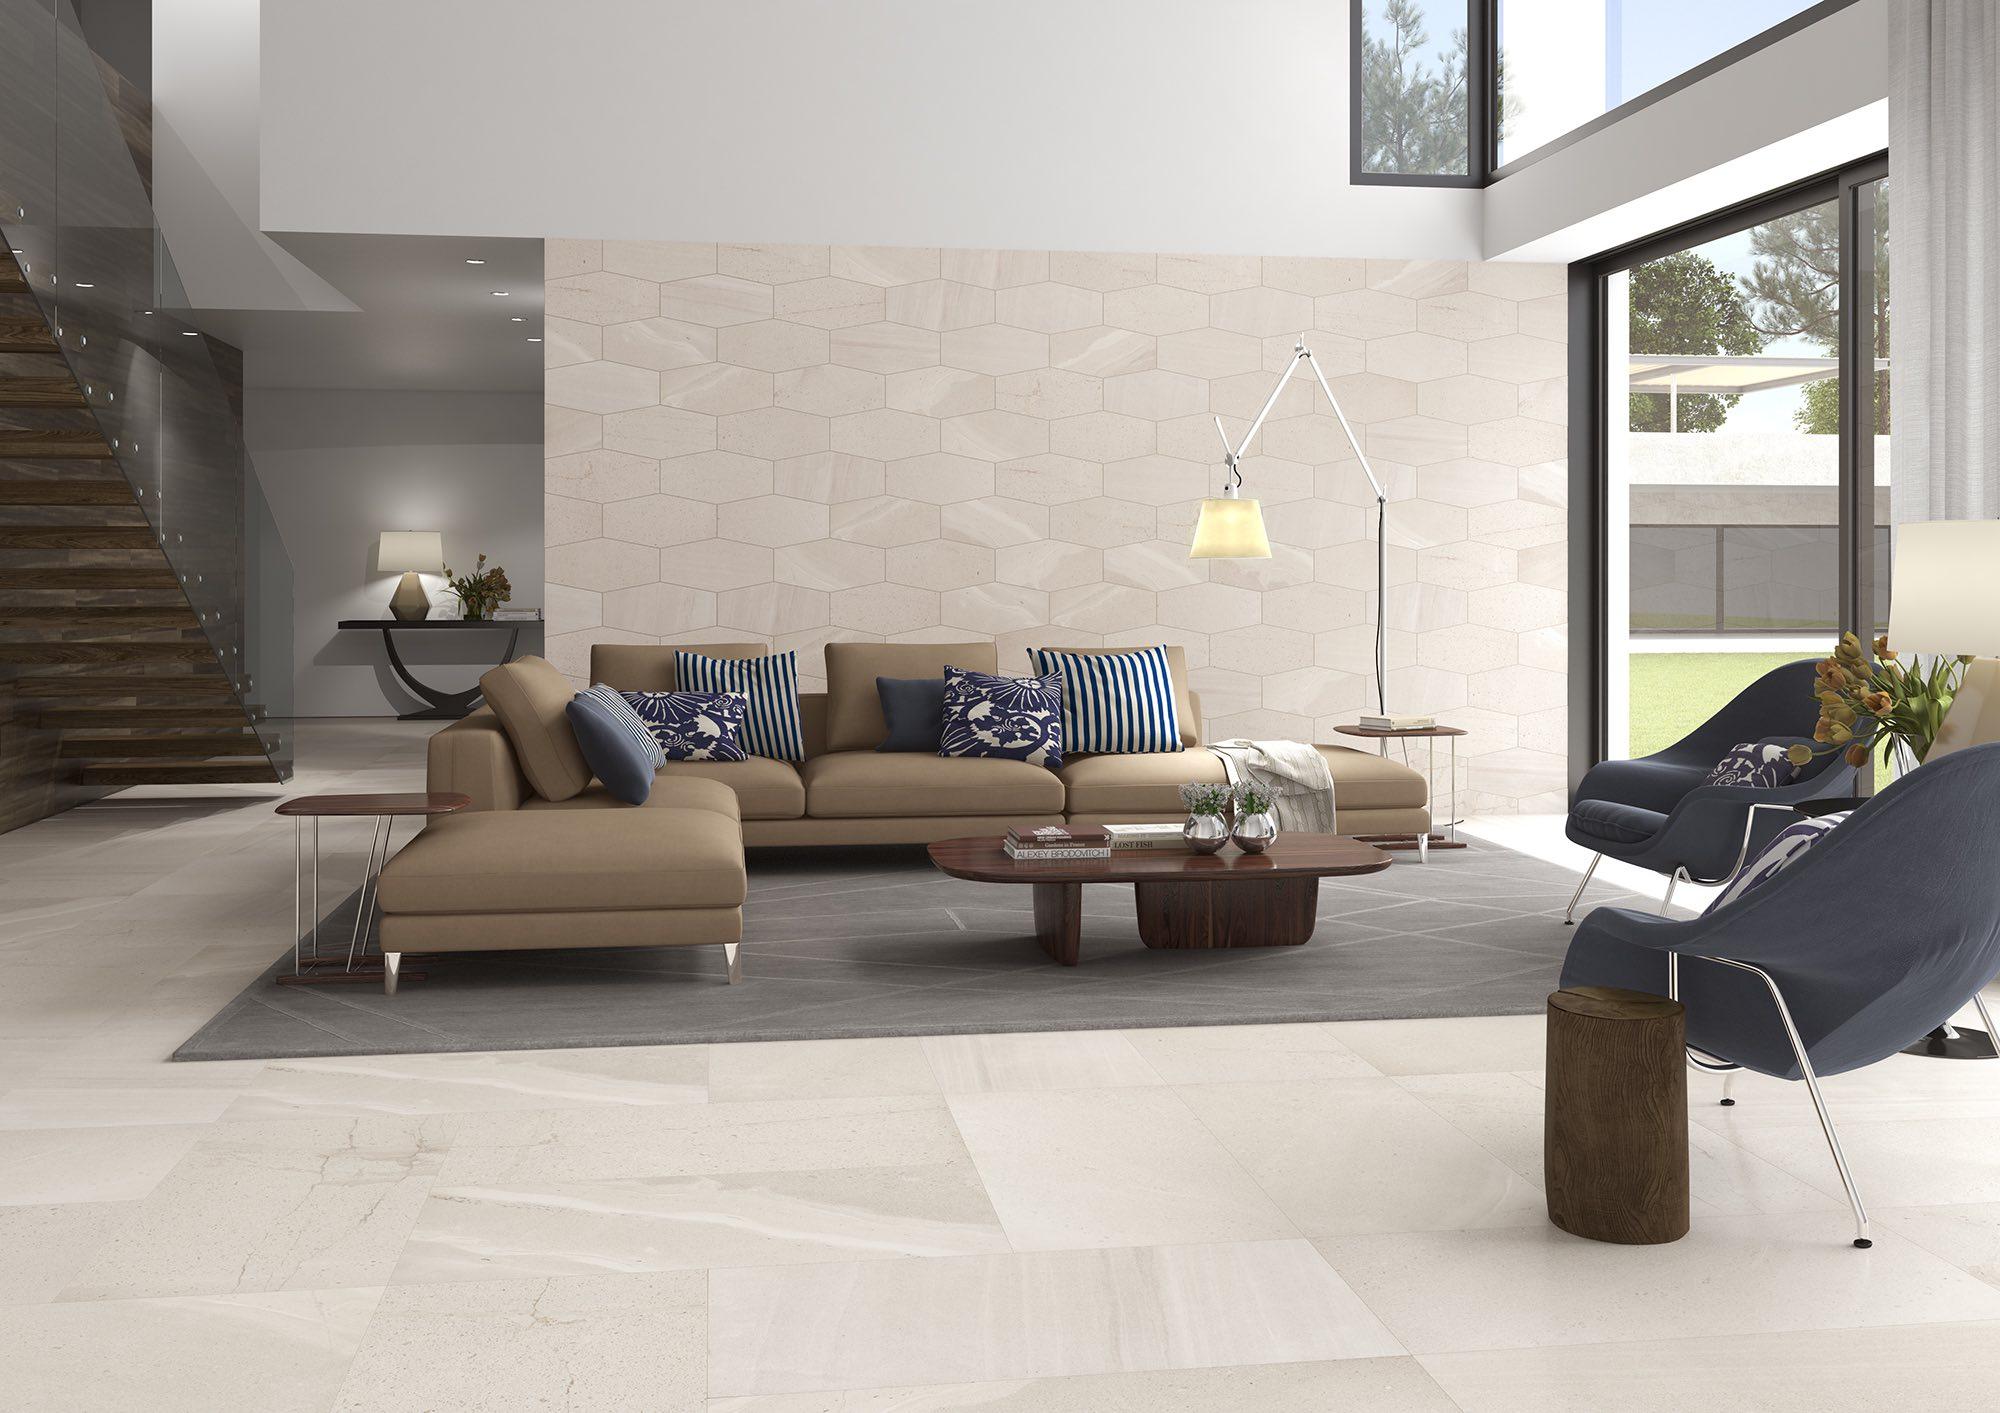 Stone Cut Hex Tiles in Living Room from Tile Mountain.jpg